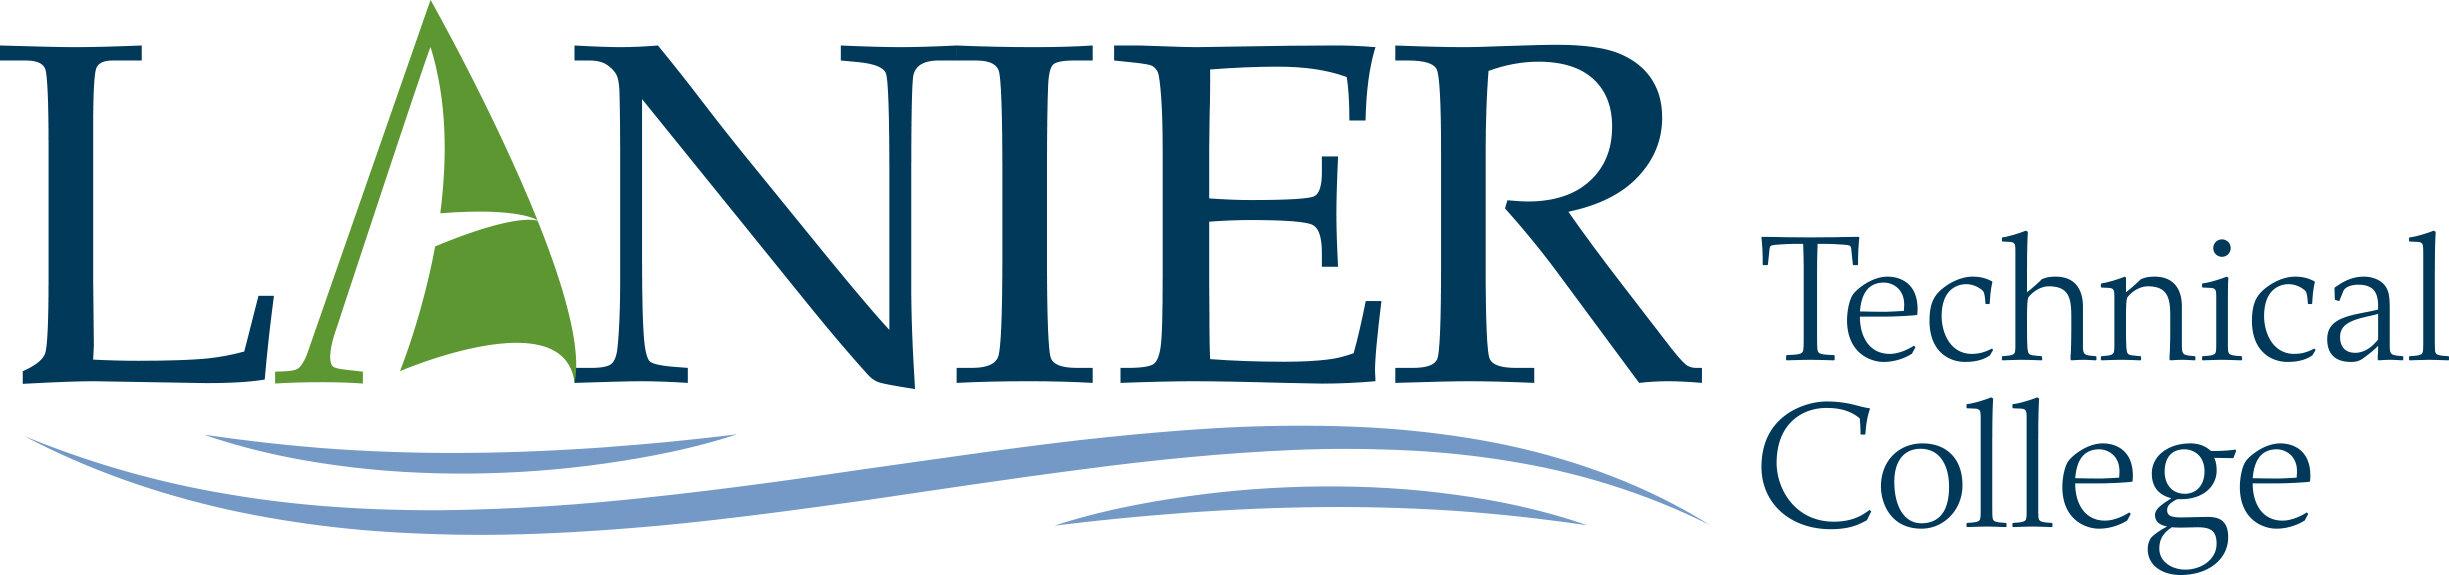 Lanier College Logo.jpg